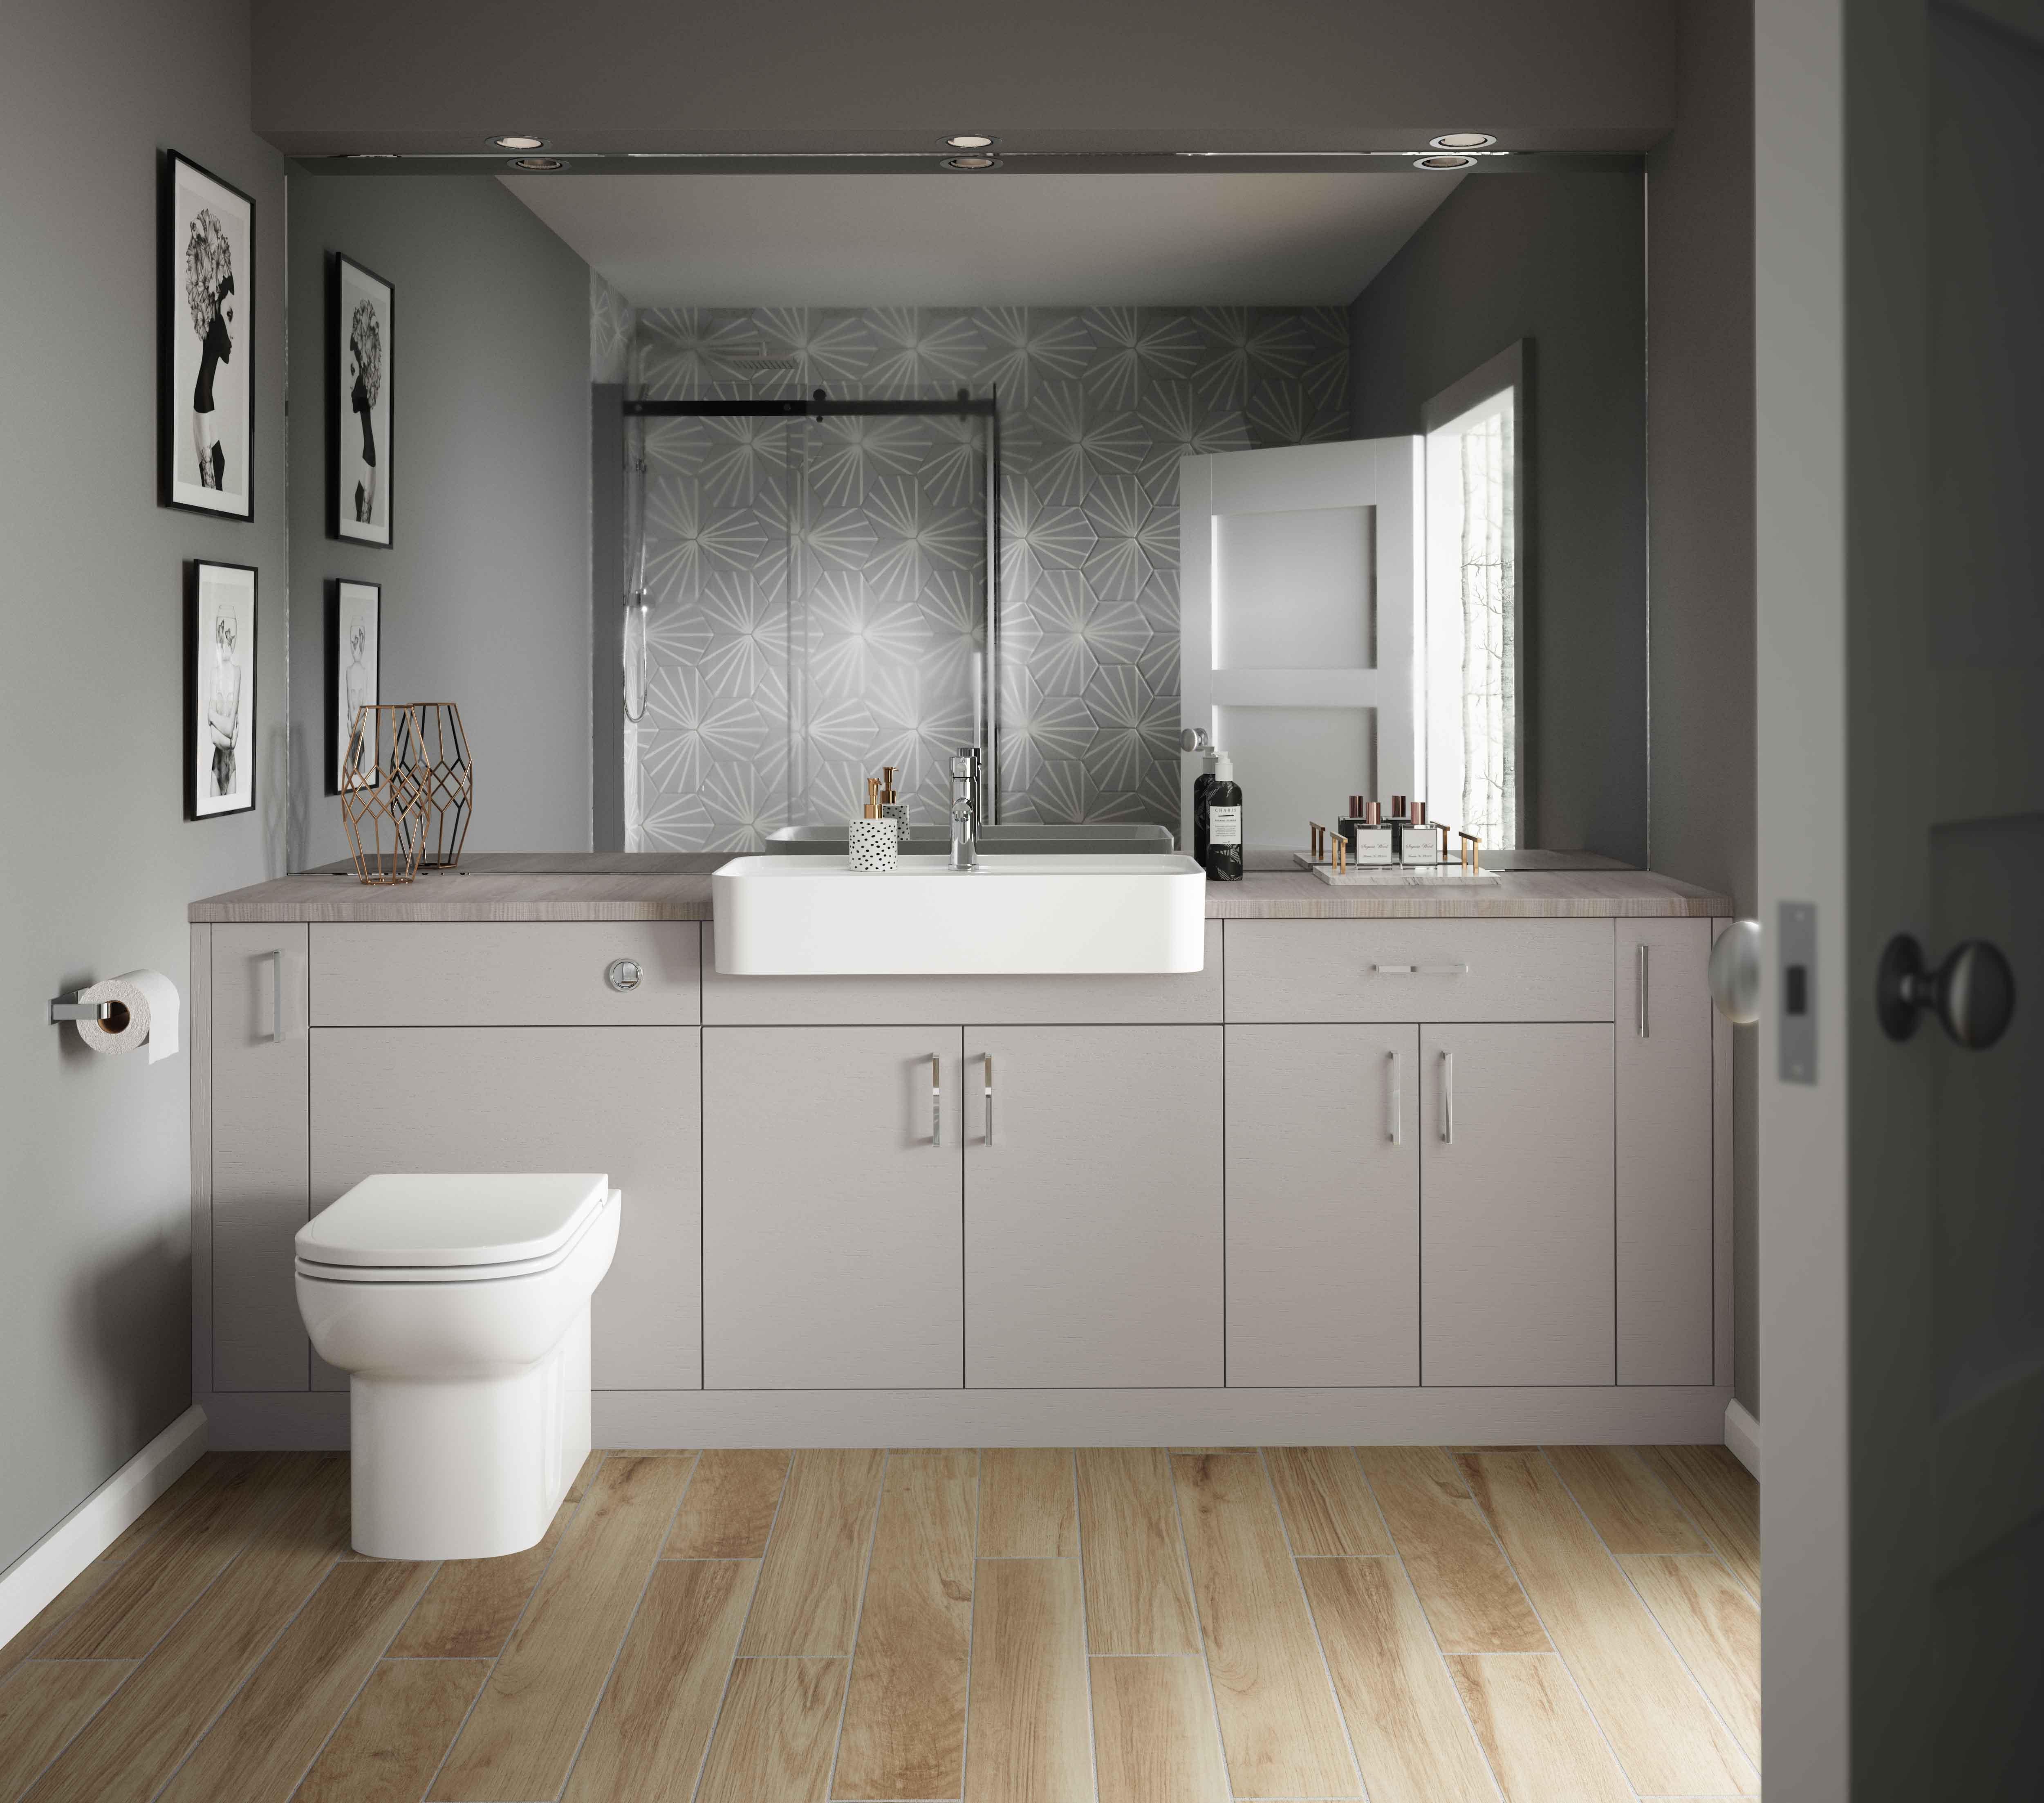 Bathrooms - Aviano - Aquadi - Symphony Group UK